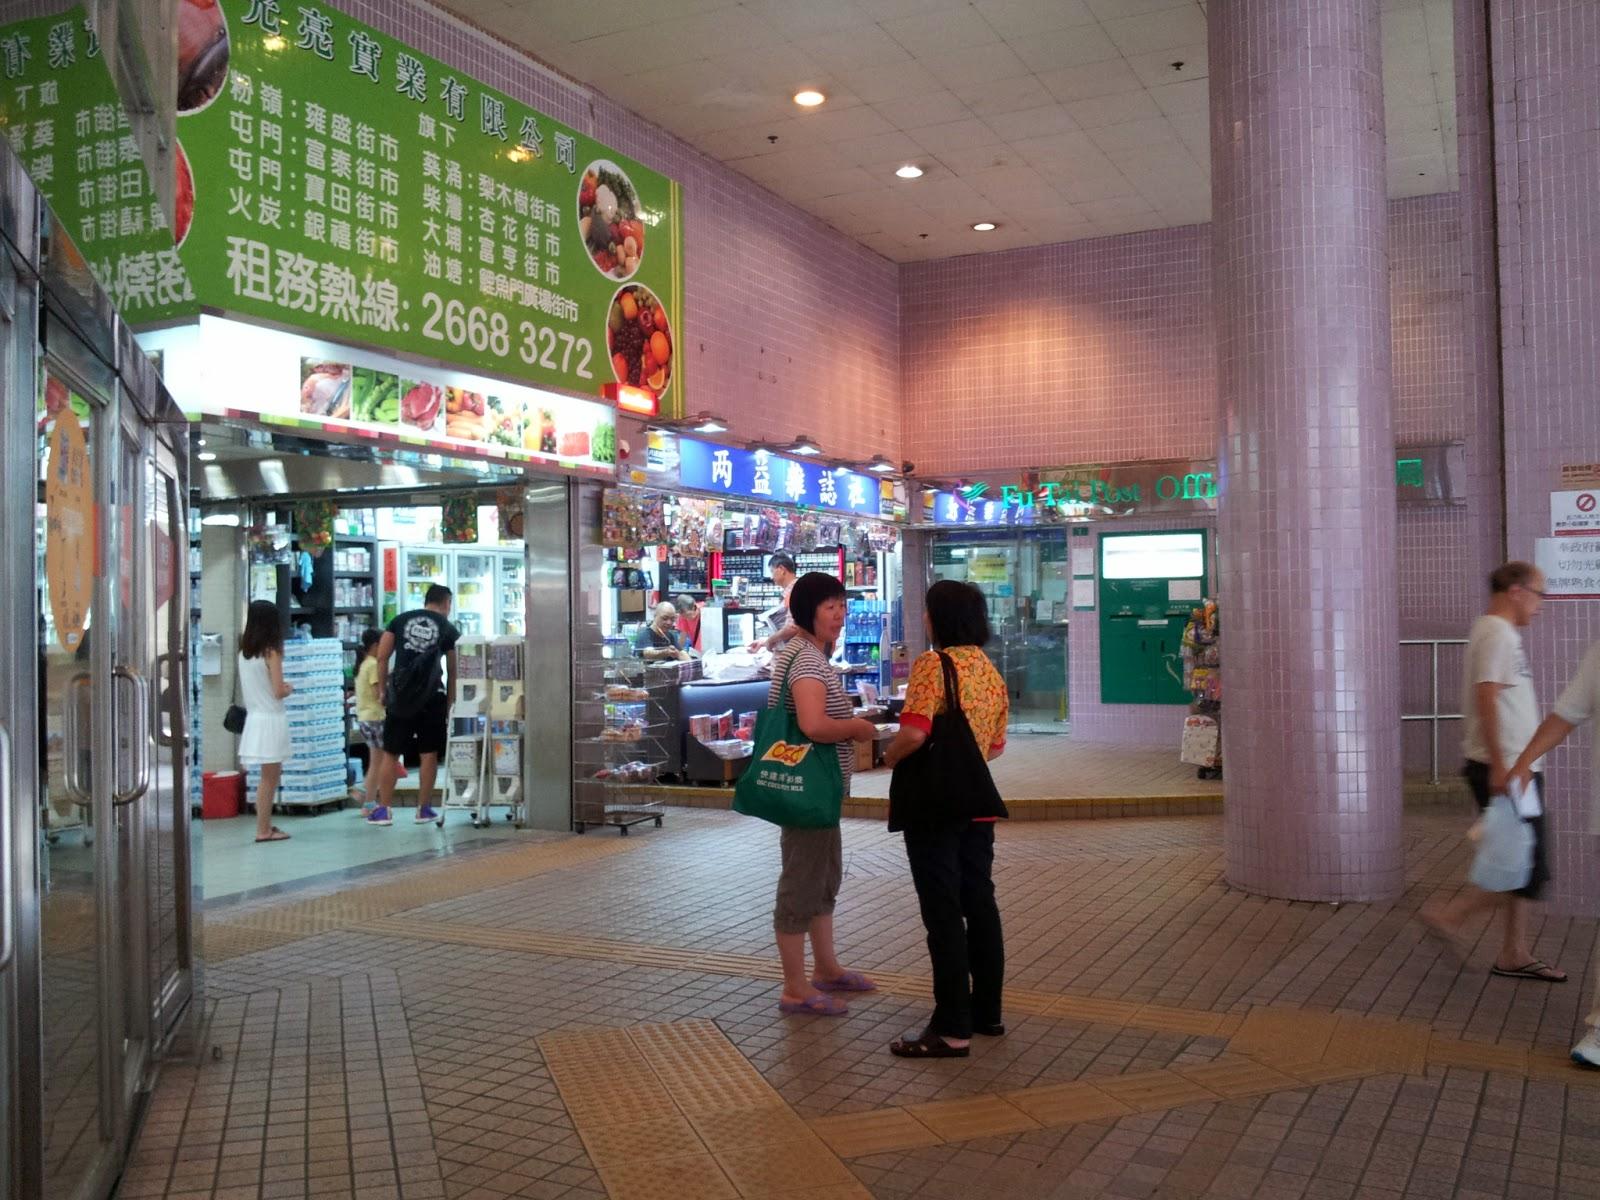 Grassroots O2: 巡視業務.領匯.富泰商場 @2014-08-02